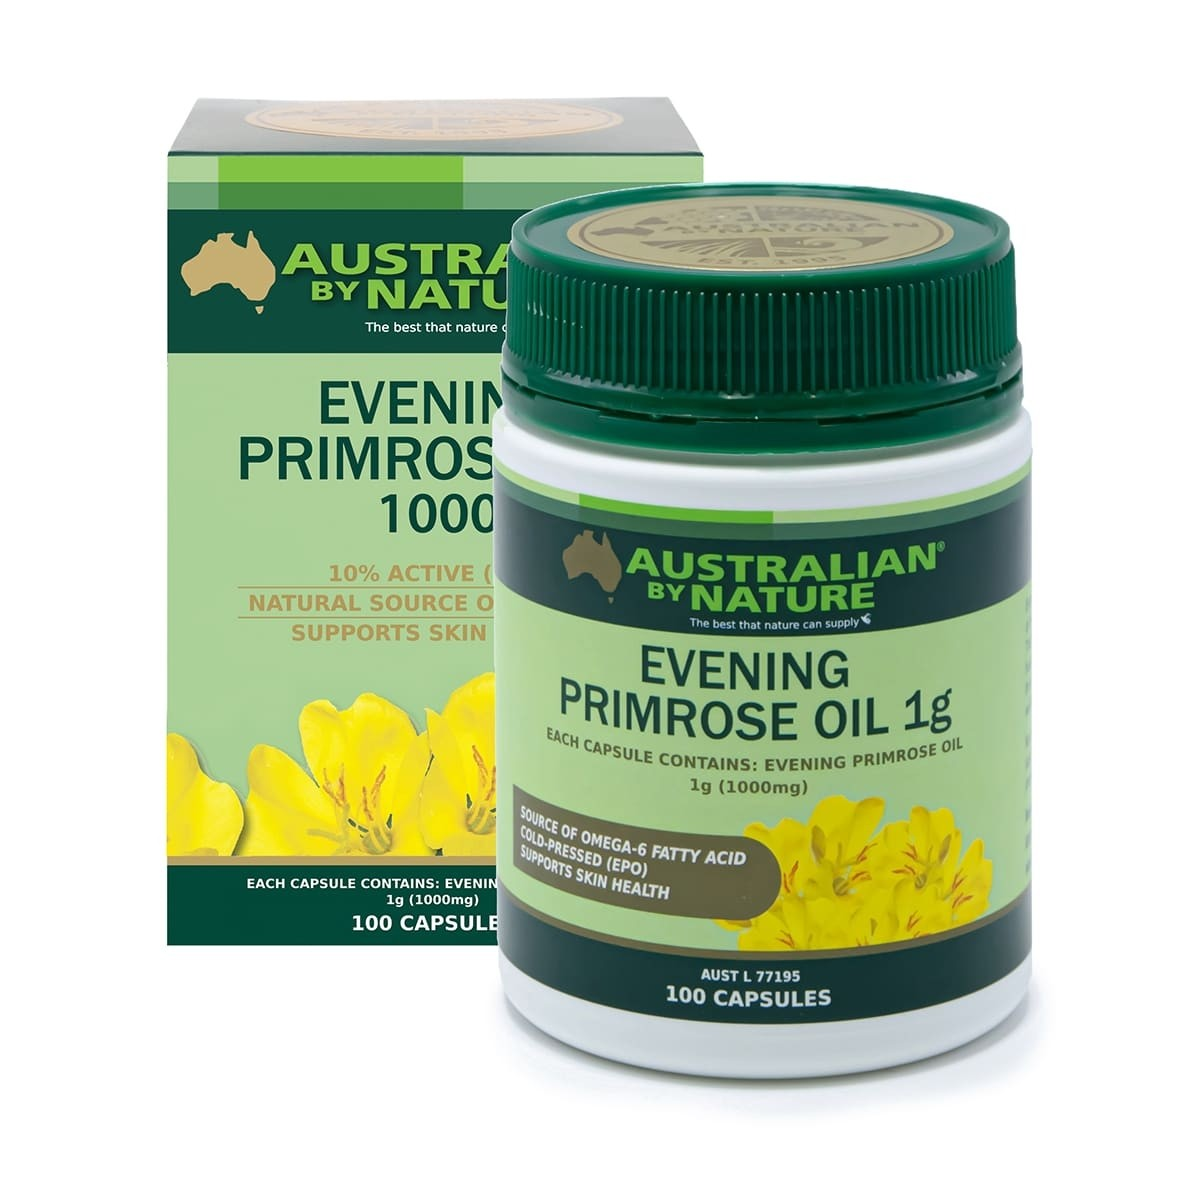 羊胎素价格_Australian by Nature Evening Primrose Oil 1000 100 Capsules   Natonic